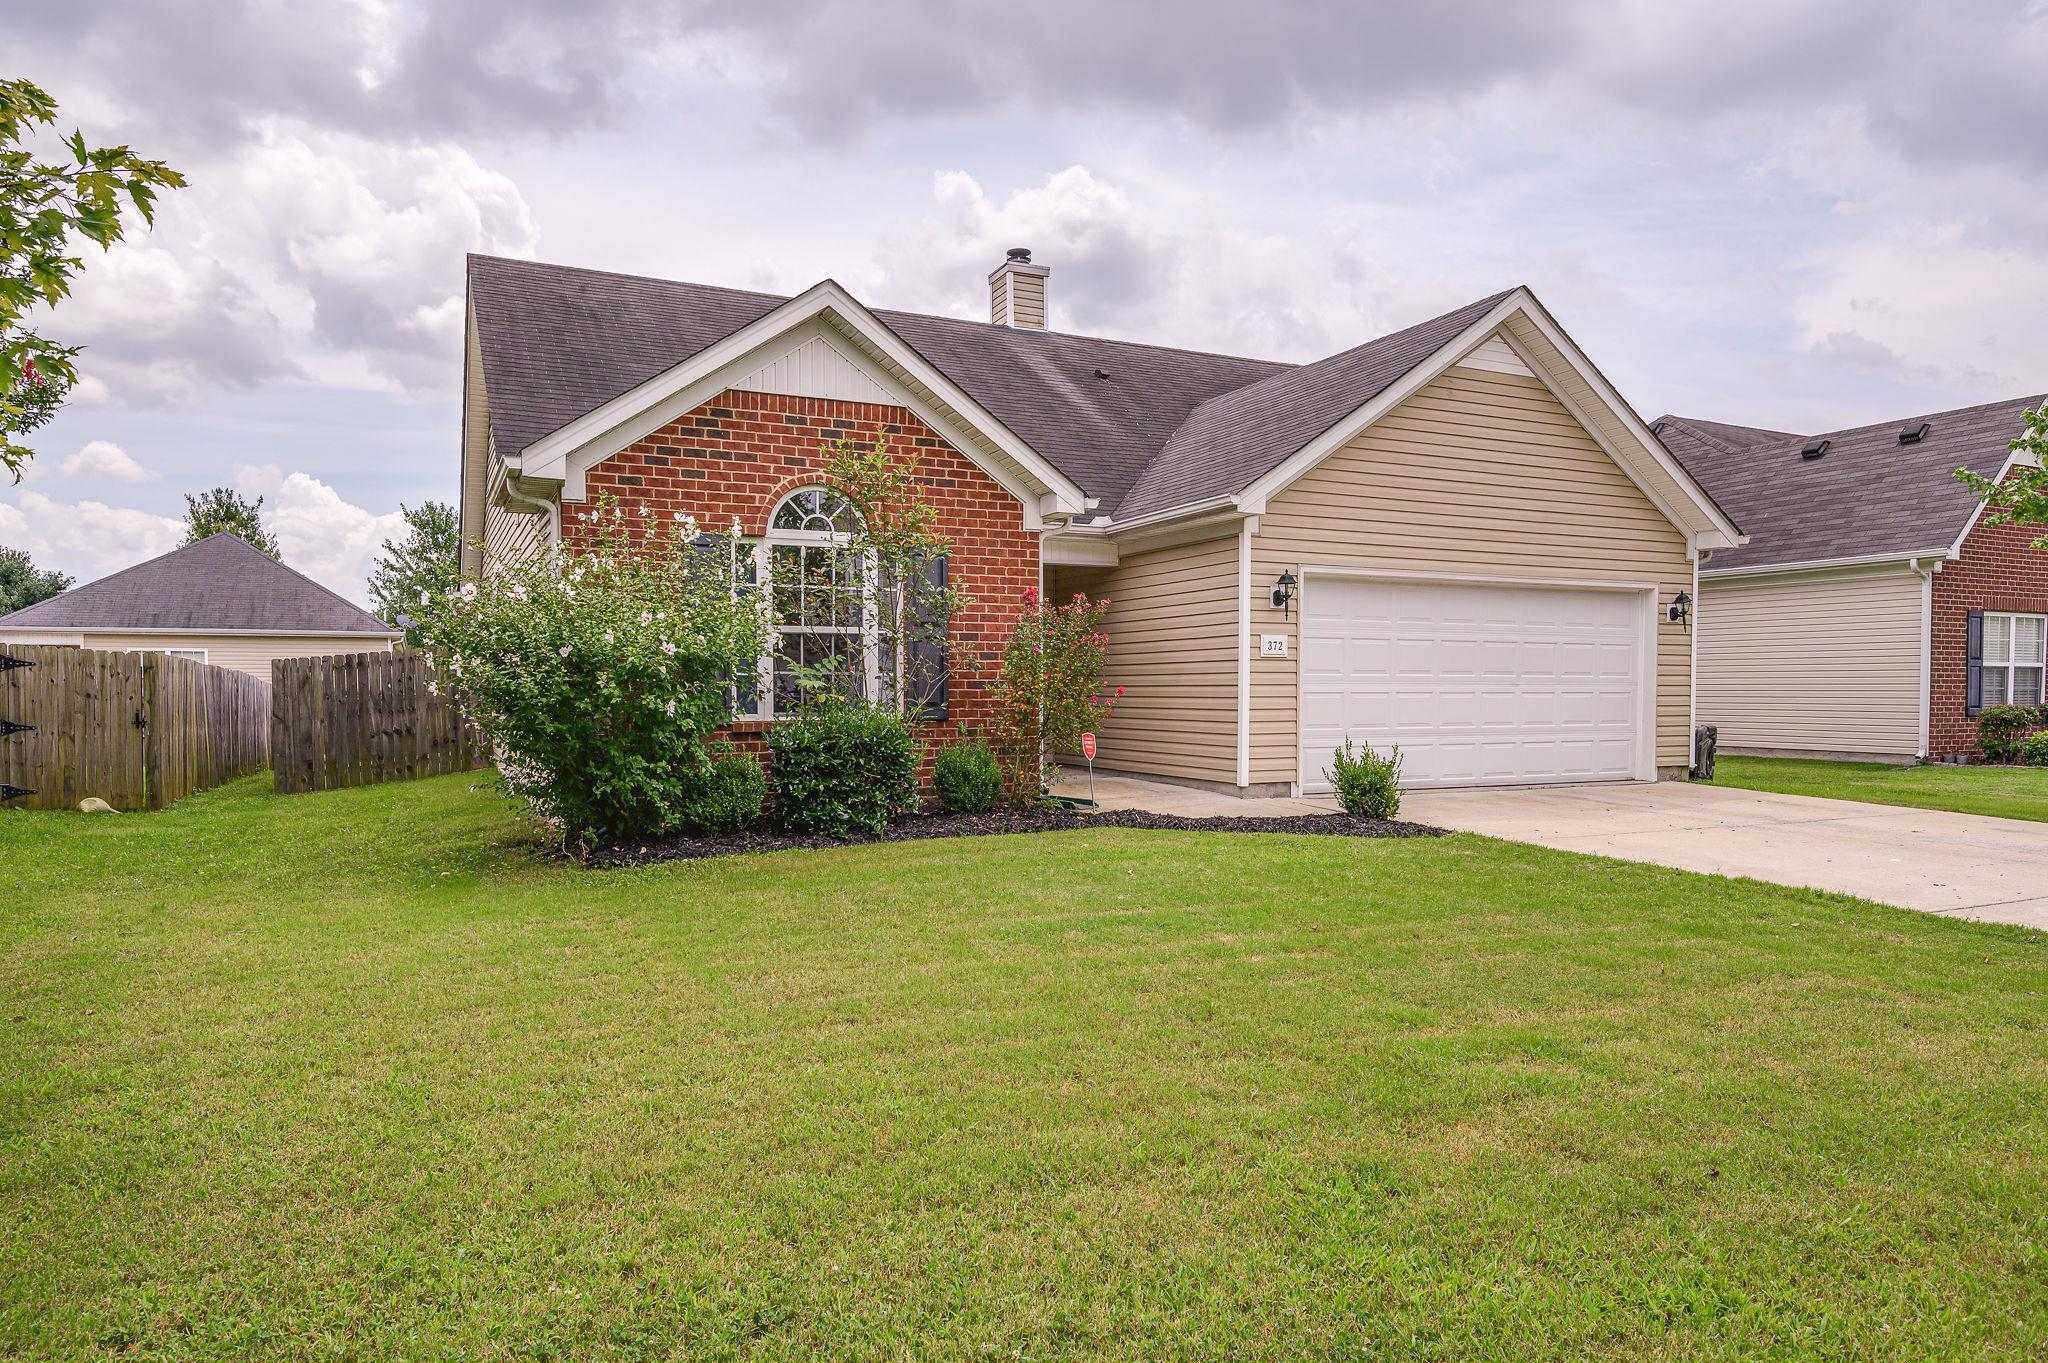 372 Sarava Ln, Smyrna, TN 37167 - Smyrna, TN real estate listing